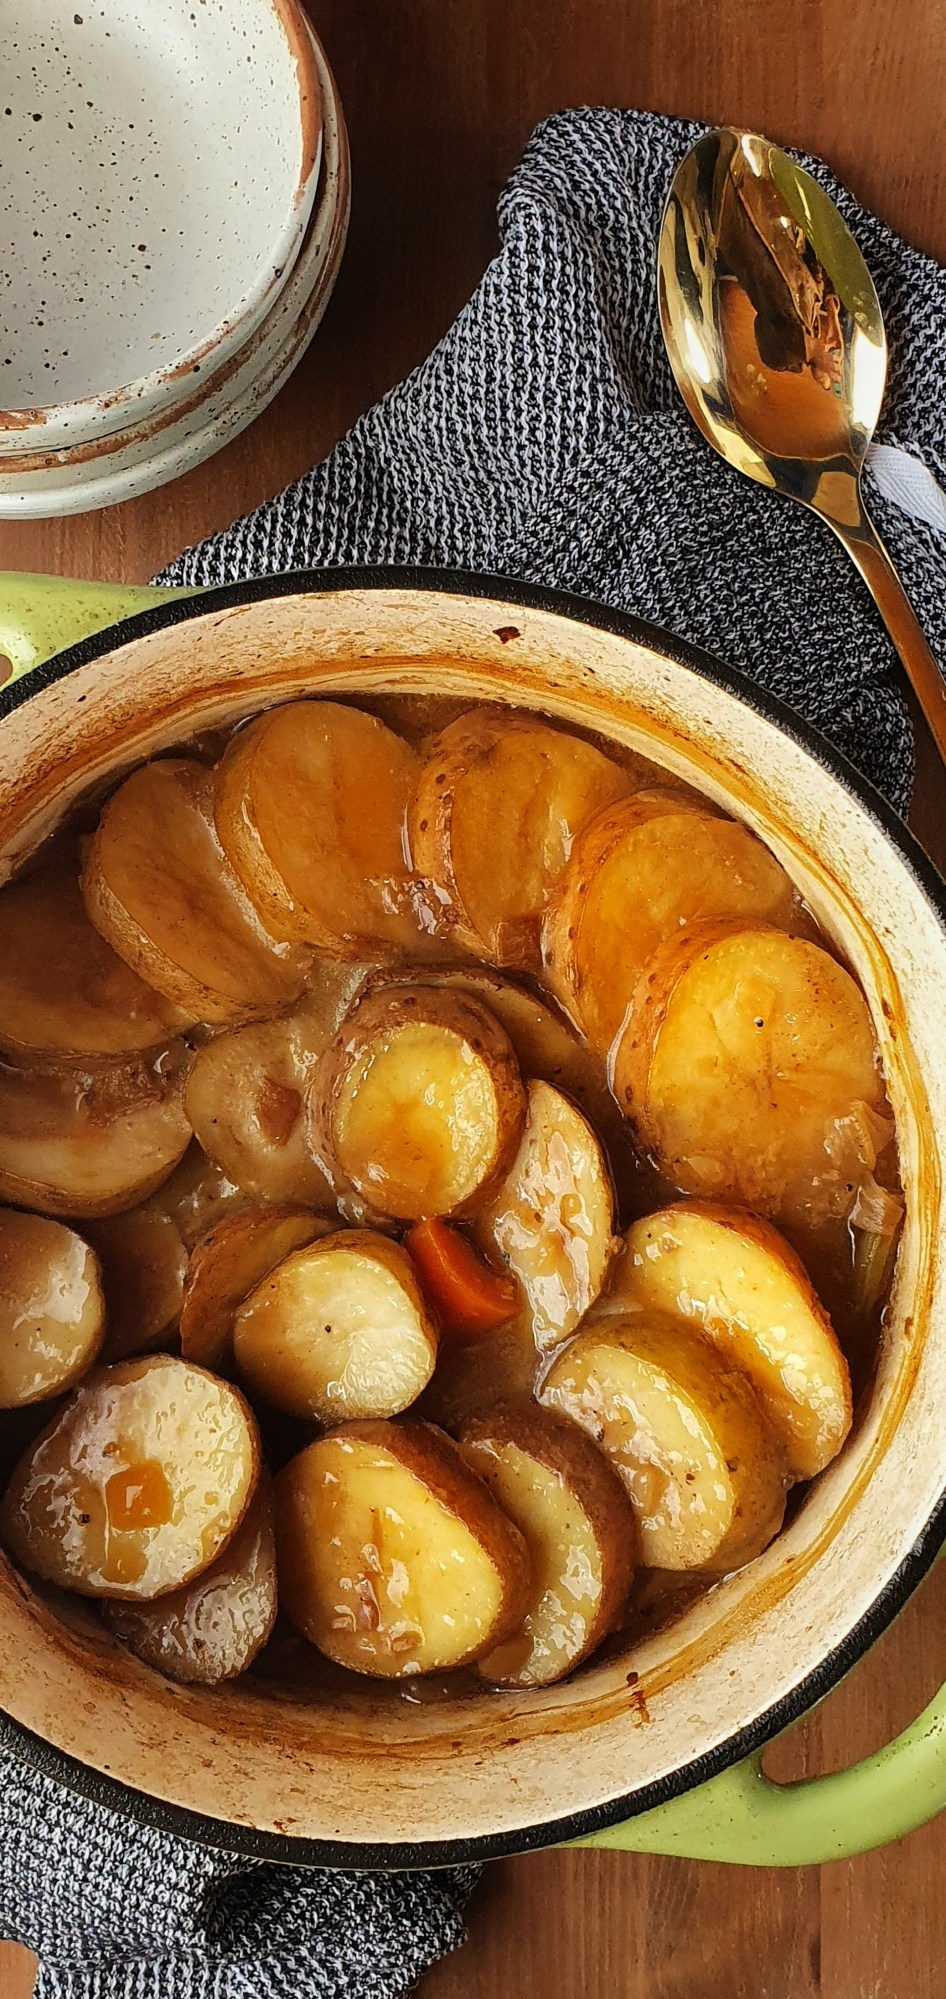 Iirsh Lamb stew